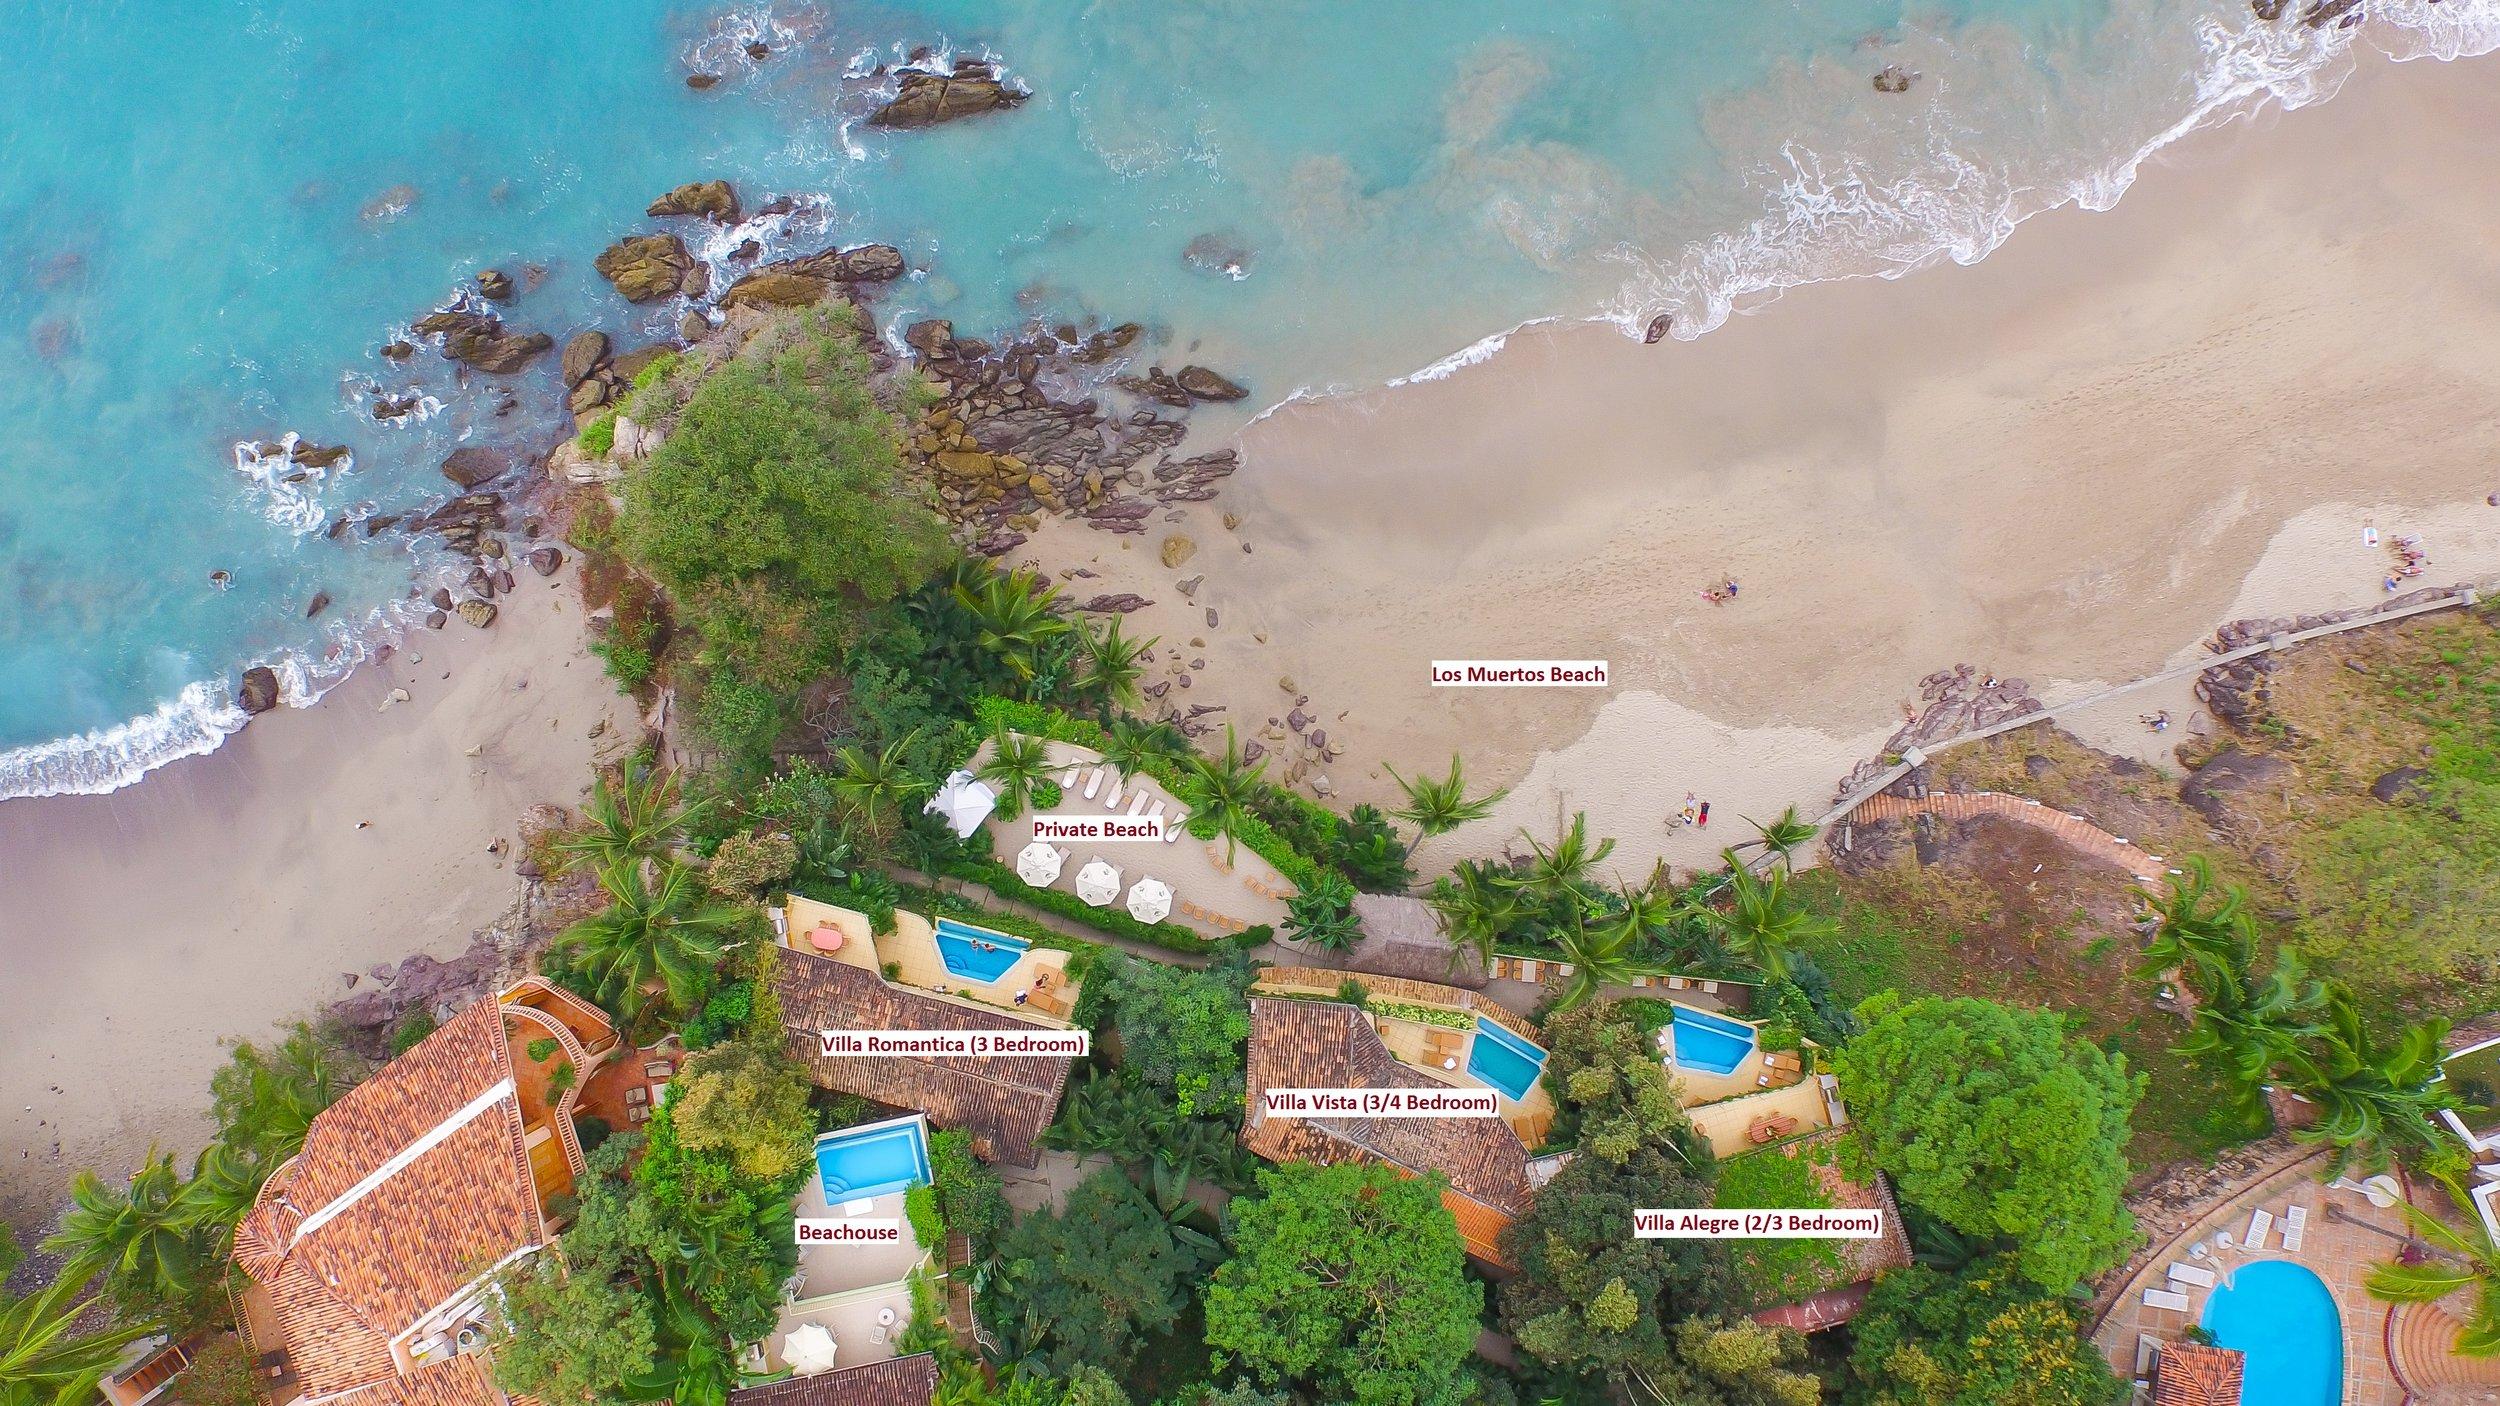 Vacation Vallarta Beachouse Aerial View